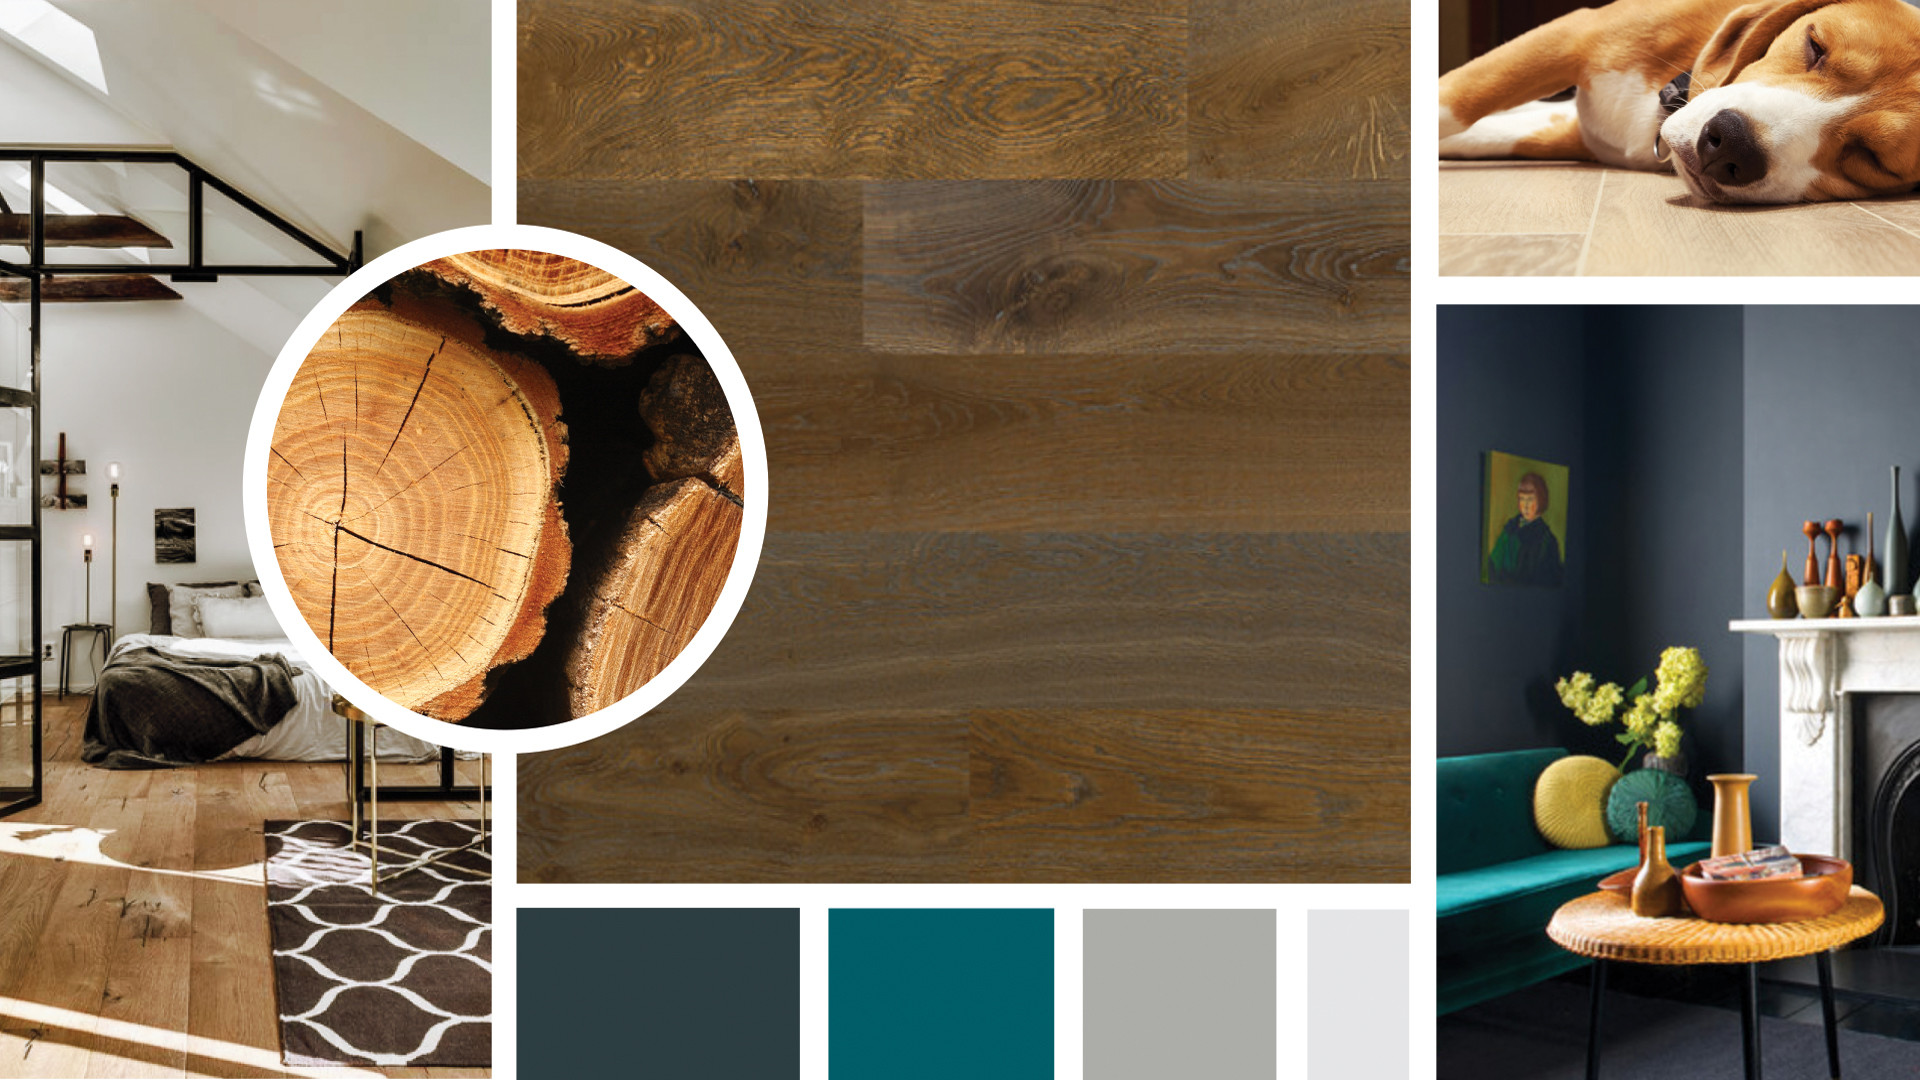 hardwood flooring grey tones of 4 latest hardwood flooring trends of 2018 lauzon flooring with new hardwood floorings